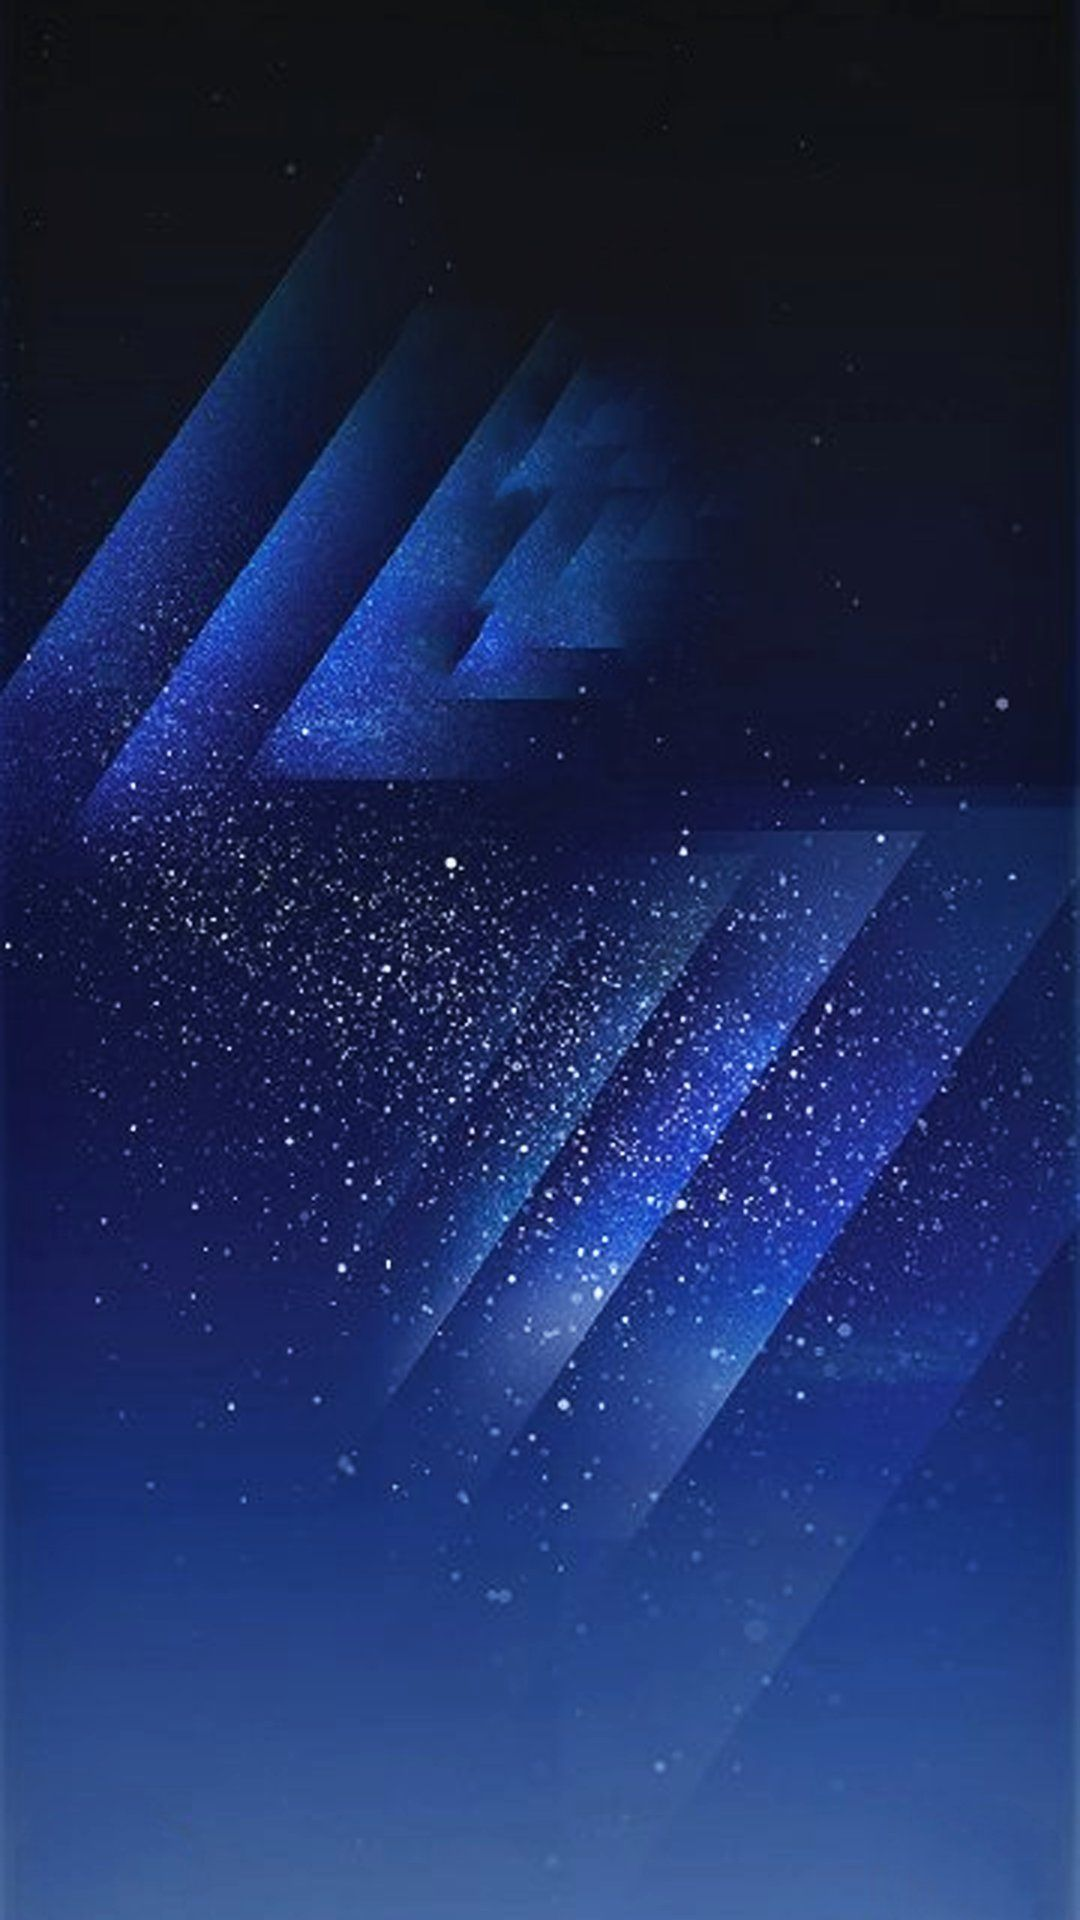 Galaxy S8 Amp S8 Plus デフォルト壁紙ダウンロード Sumacase Com Iphone 用壁紙 壁紙 デザイン